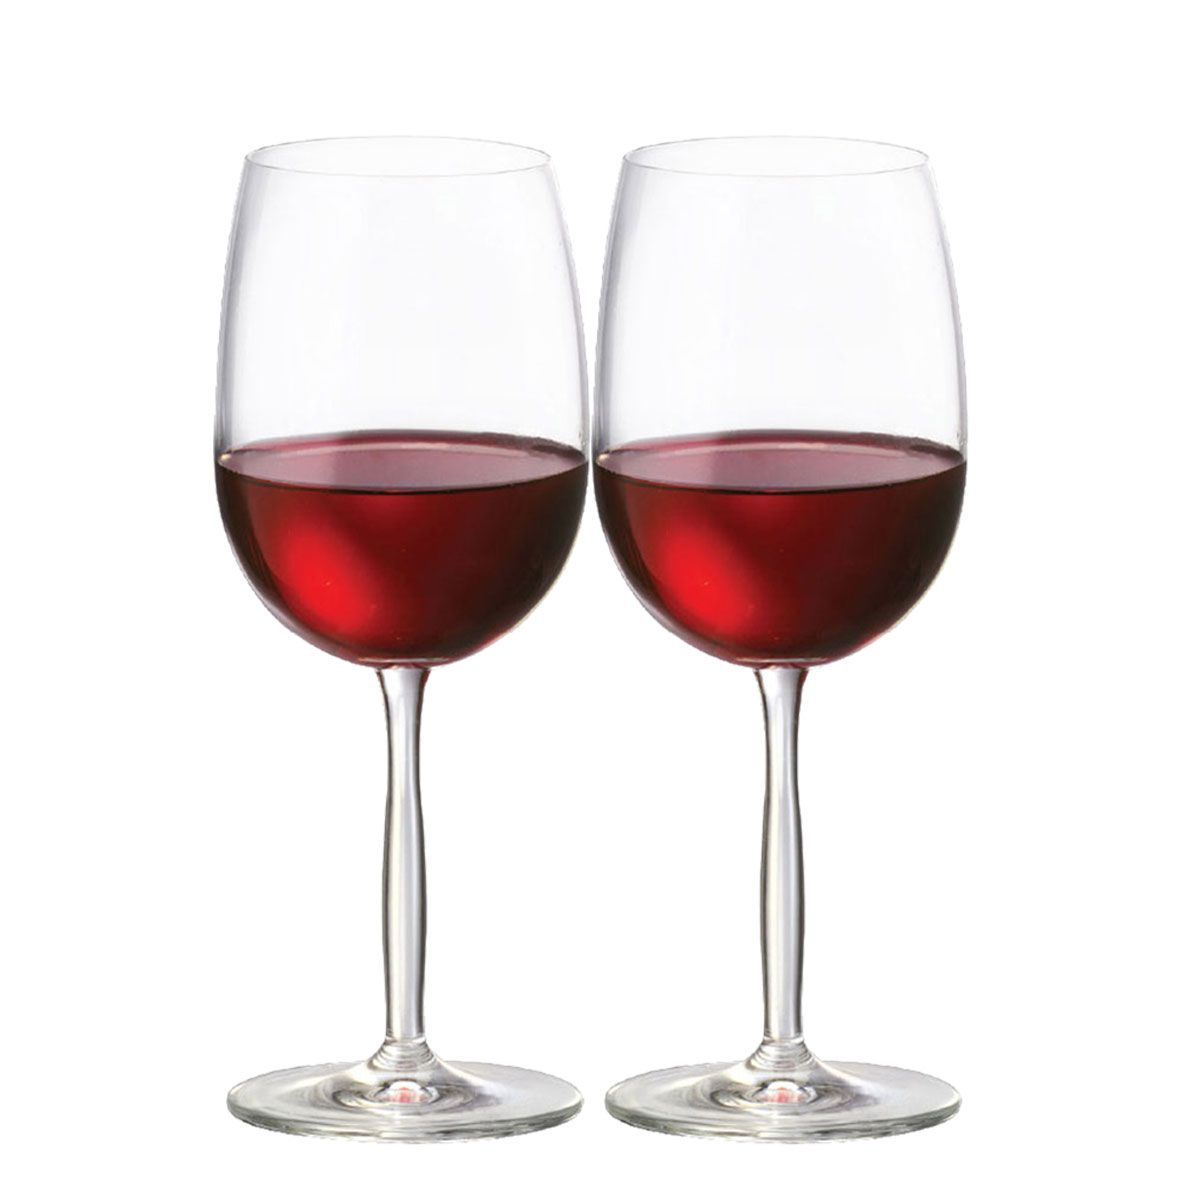 Jogo de Taça de Vinho Tinto Cristal Ritz 48ml 2 Pcs